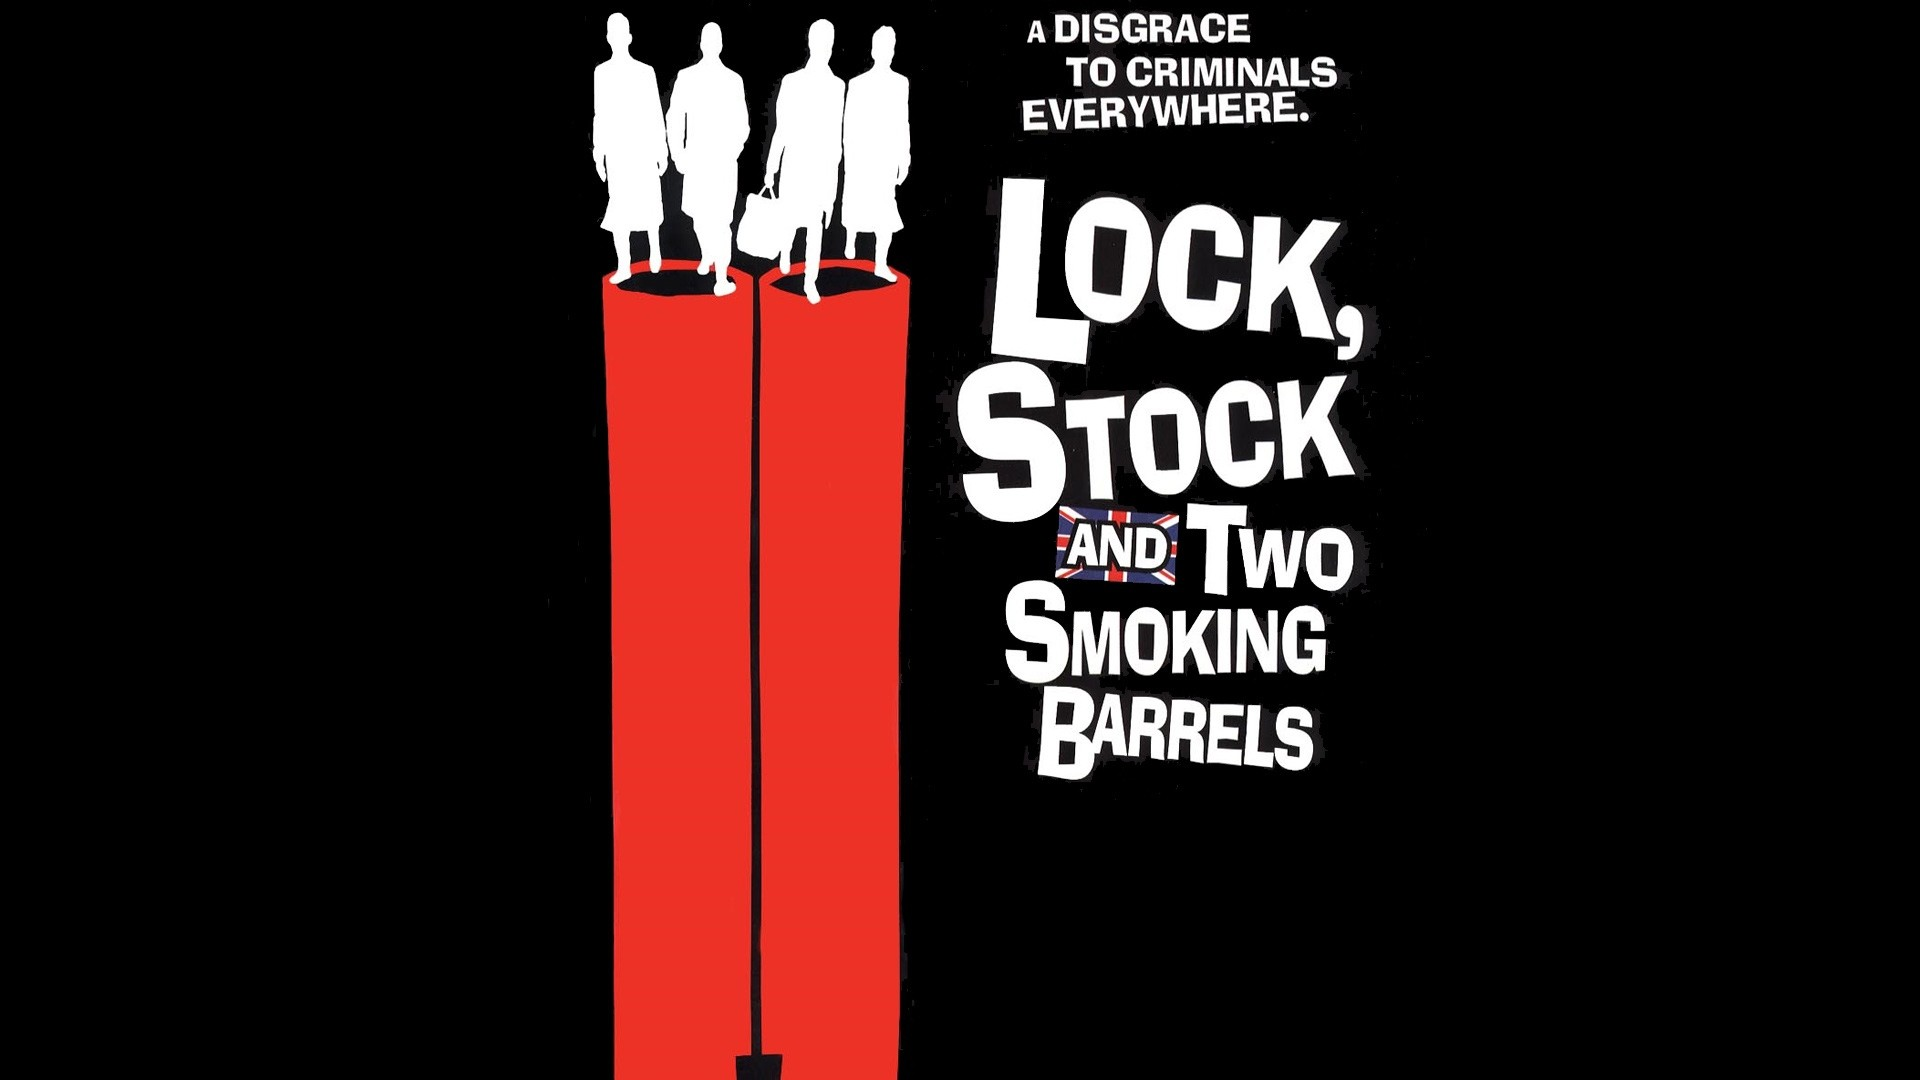 Wallpaper lock stock and two smoking barrels, gun, black, red